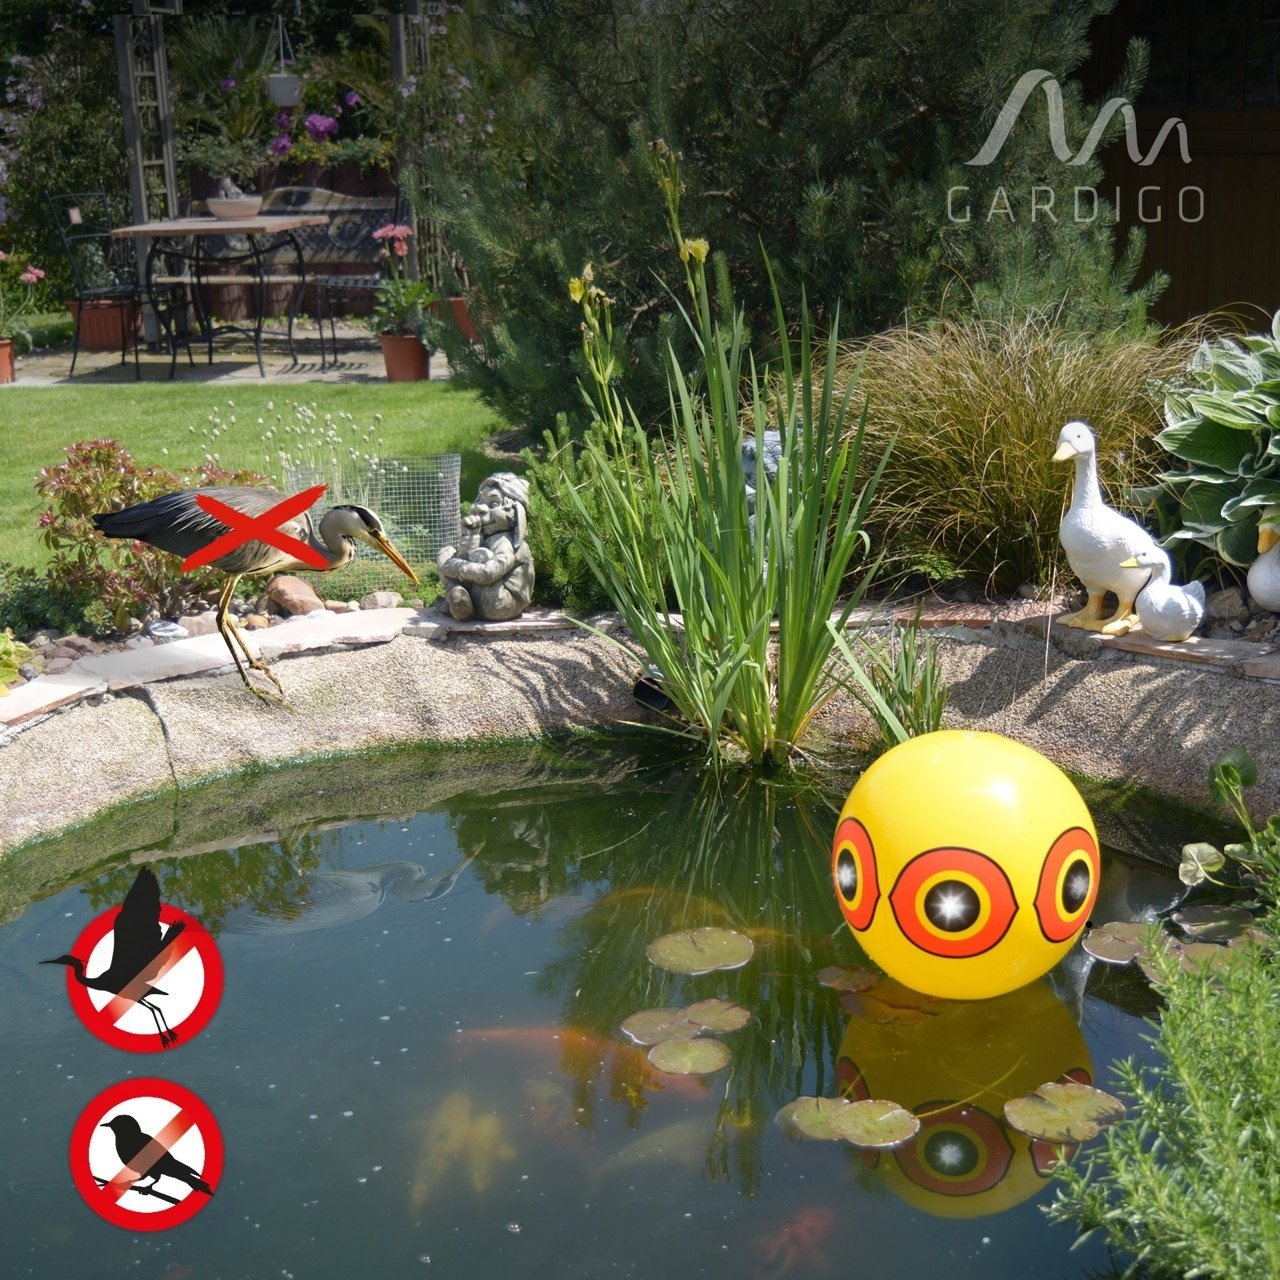 2 Balones con Ojos Espantap/ájaros; Ahuyentador para Espantar Aves Carpinteros Pichones Gorriones Gardigo